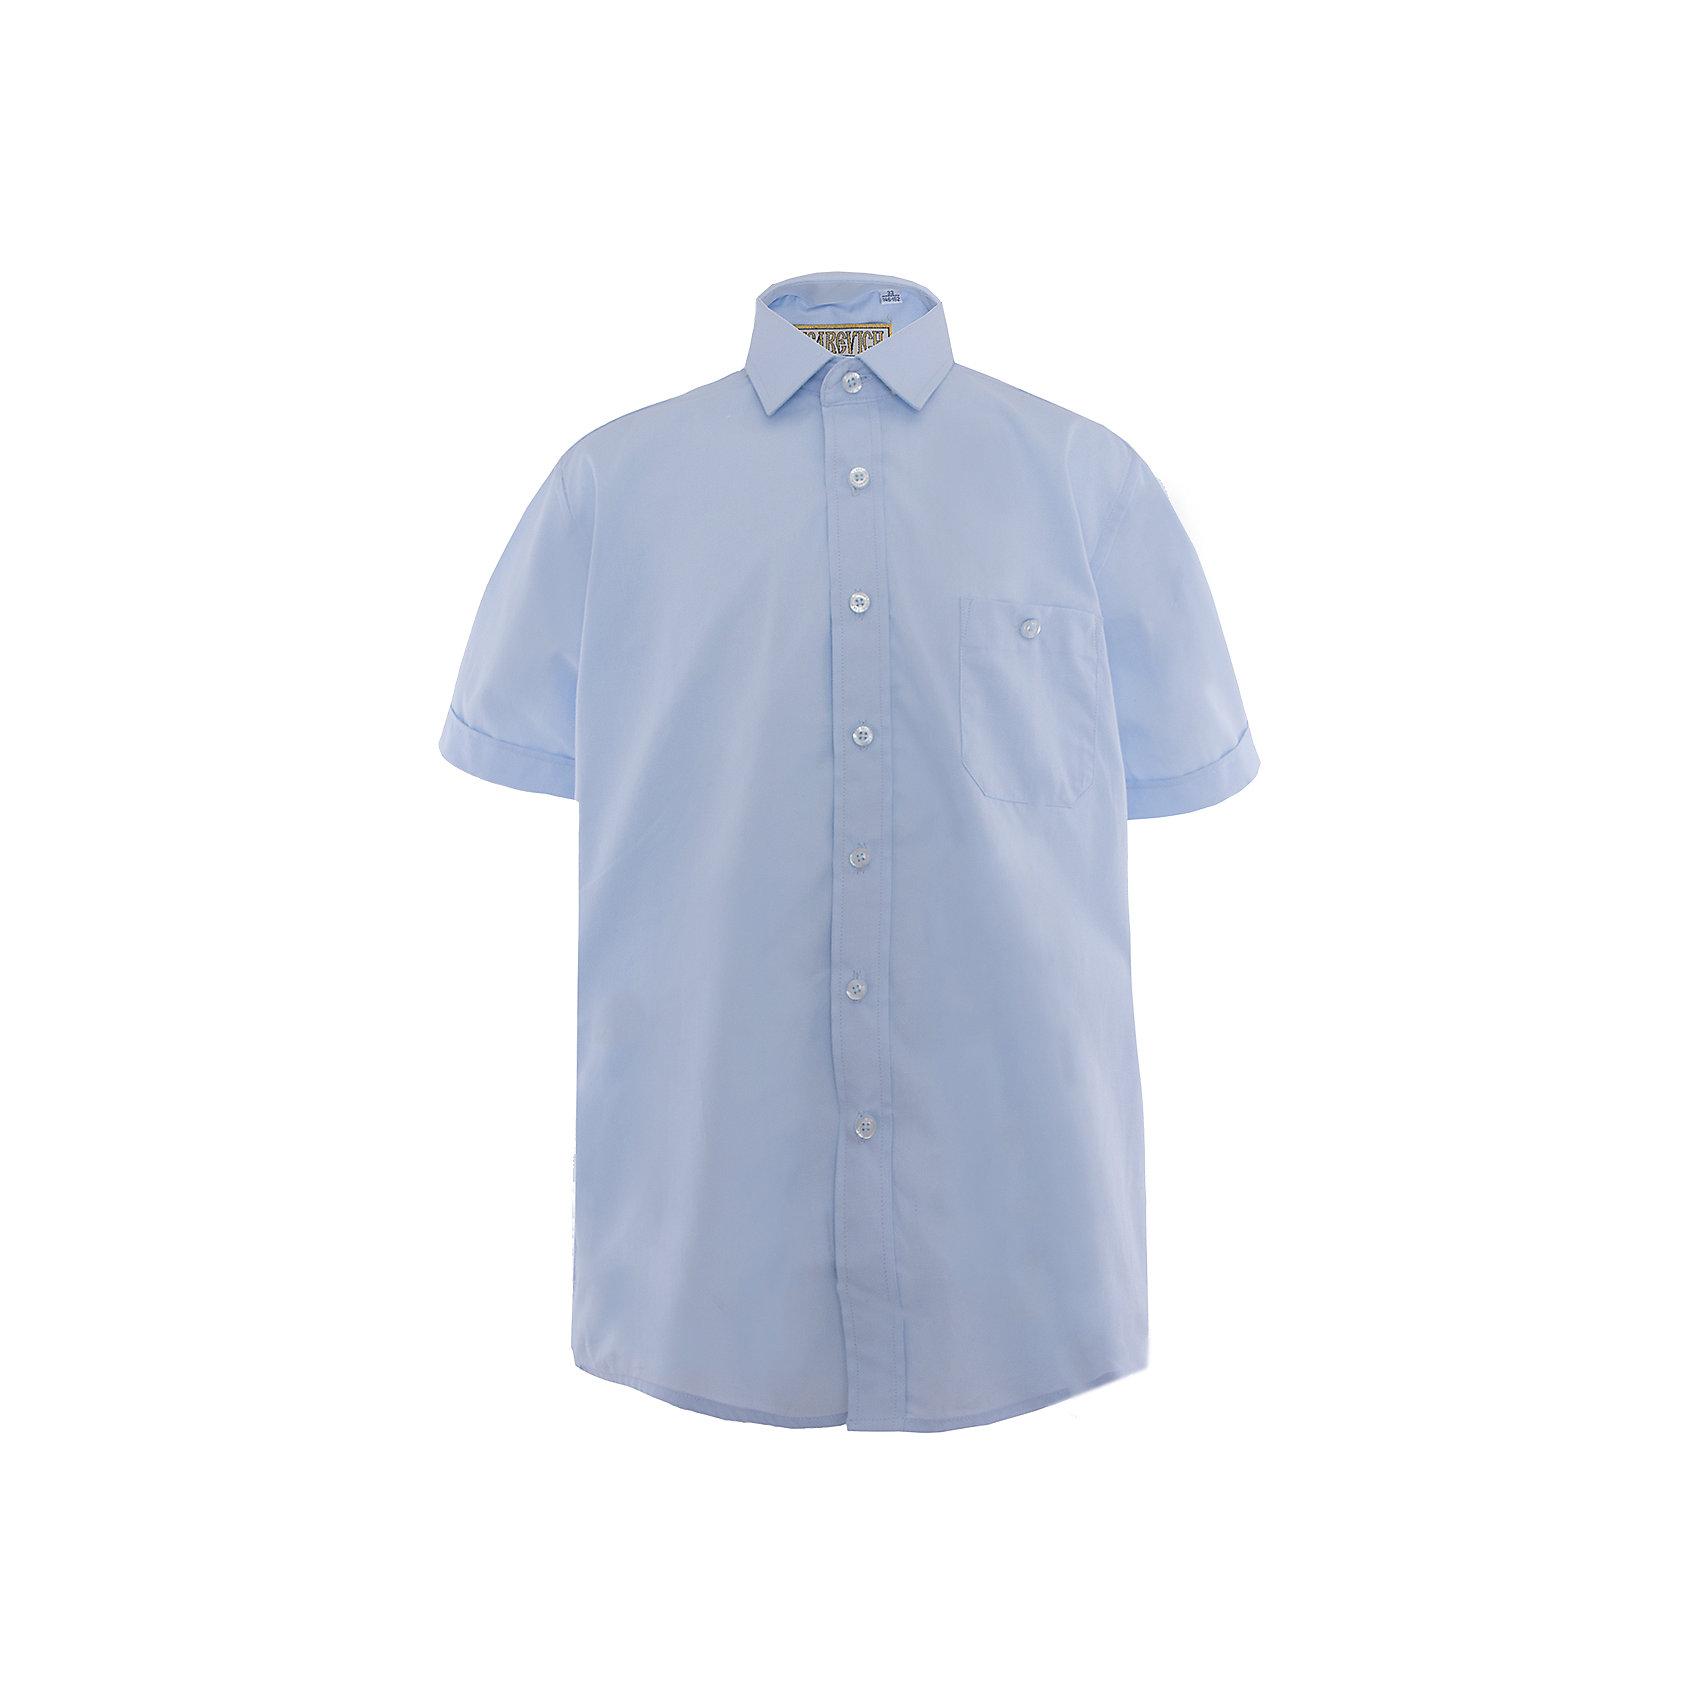 Рубашка для мальчика  TsarevichБлузки и рубашки<br>Рубашка для мальчика от российской марки Tsarevich.<br>Состав:<br>80% хлопок  20% полиэстер<br><br>Ширина мм: 174<br>Глубина мм: 10<br>Высота мм: 169<br>Вес г: 157<br>Цвет: голубой<br>Возраст от месяцев: 144<br>Возраст до месяцев: 156<br>Пол: Мужской<br>Возраст: Детский<br>Размер: 152/158,128/134,158/164,164/170,146/152,134/140,122/128,140/146<br>SKU: 4163619